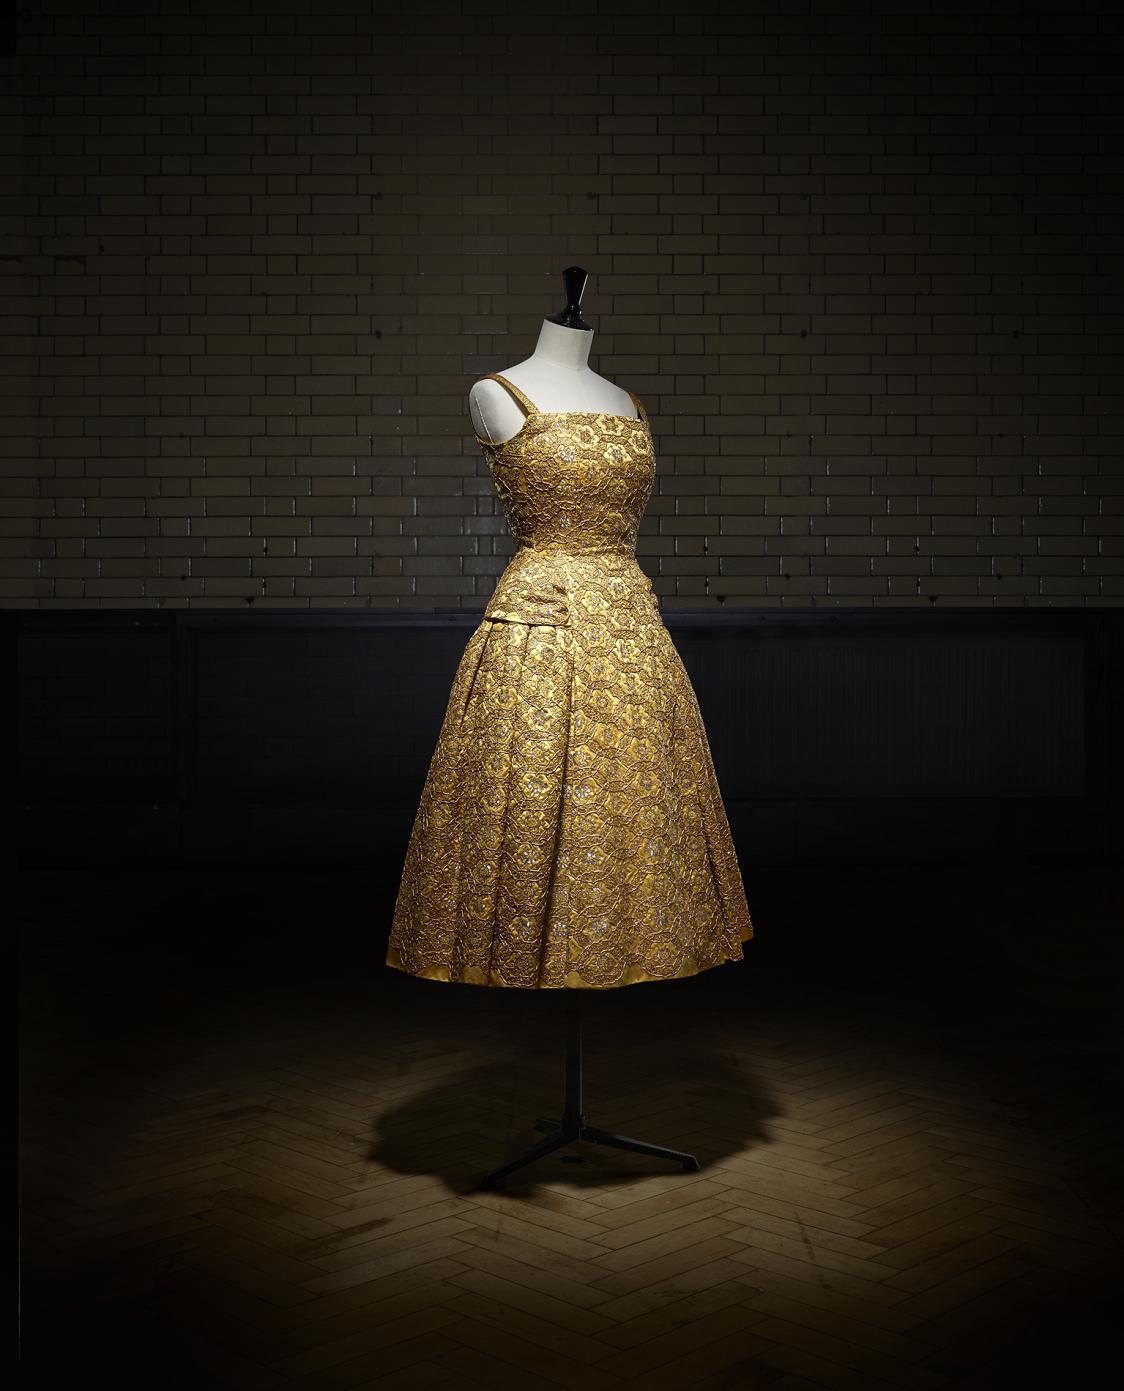 Pérou korte avondjurk, herfst-winter 1954 Haute Couture collectie, H line - foto Laziz Hamani.